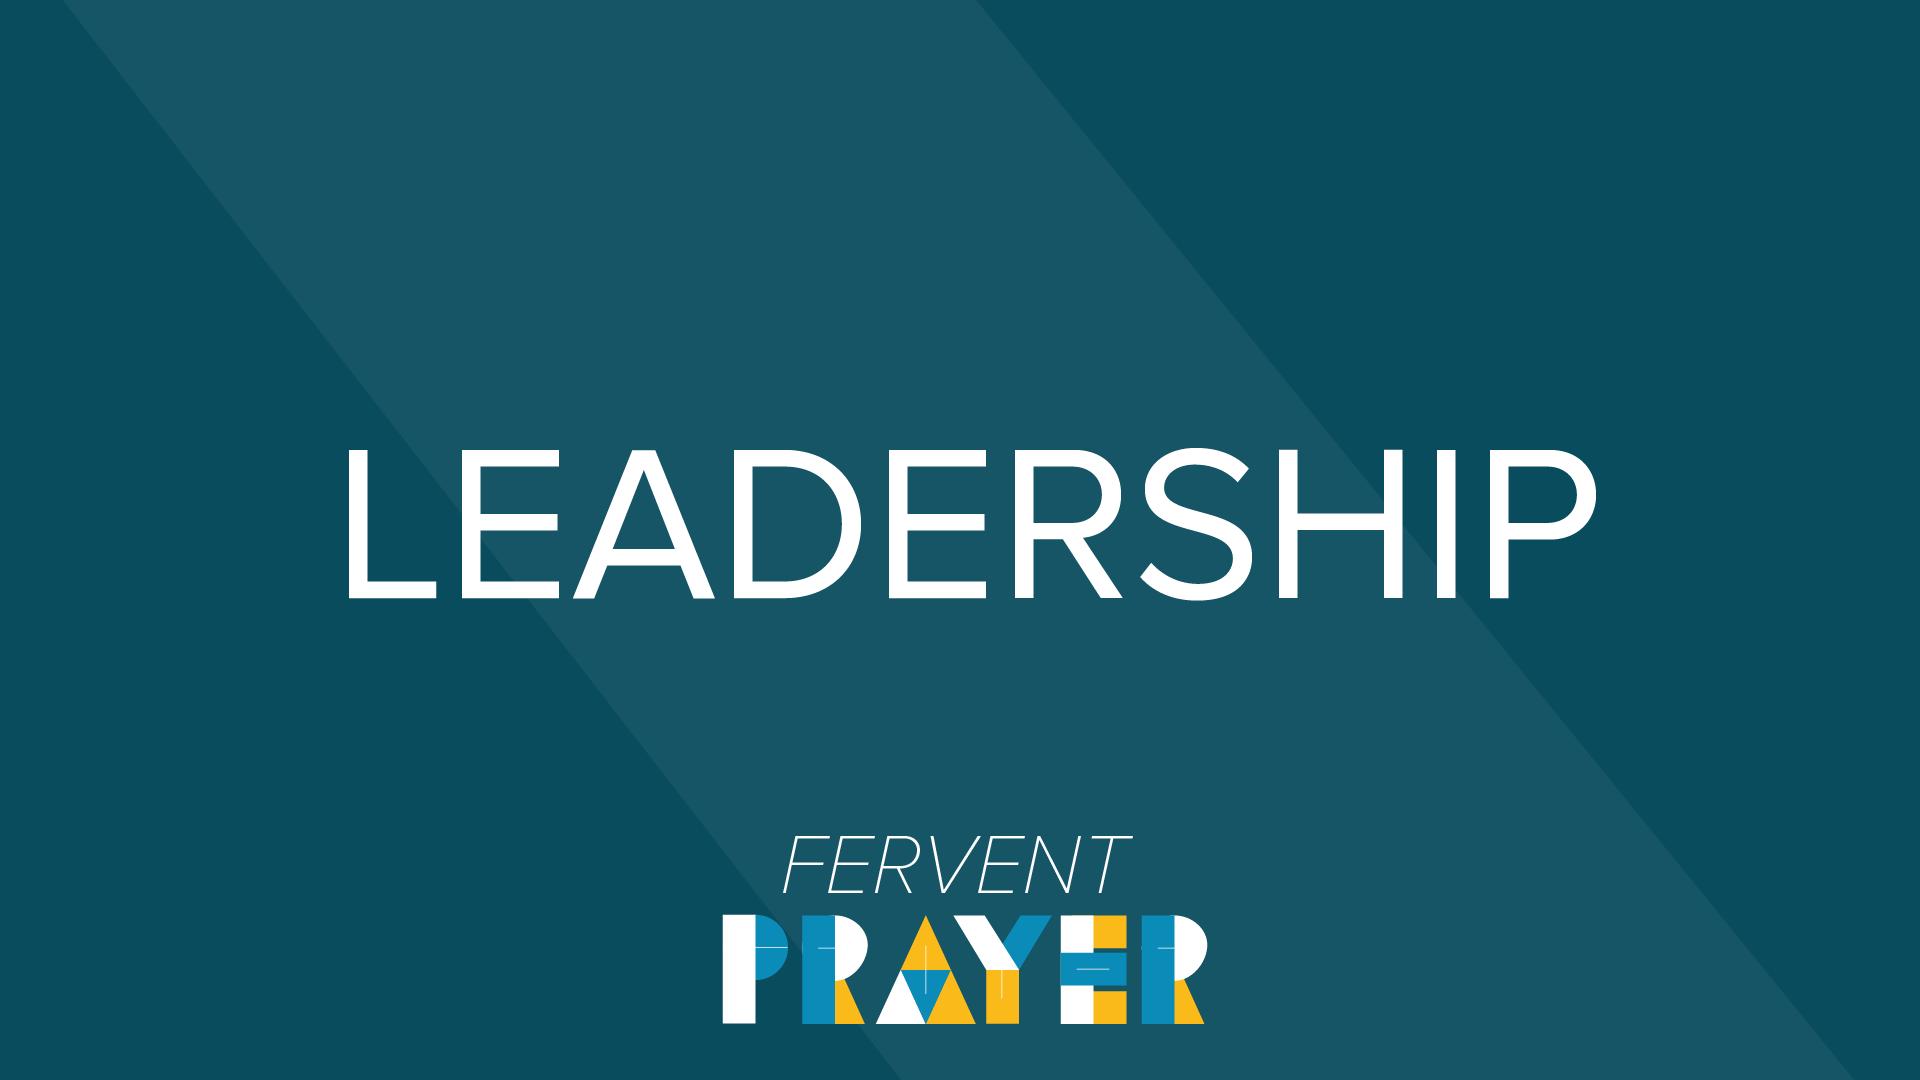 fervent prayer leadership